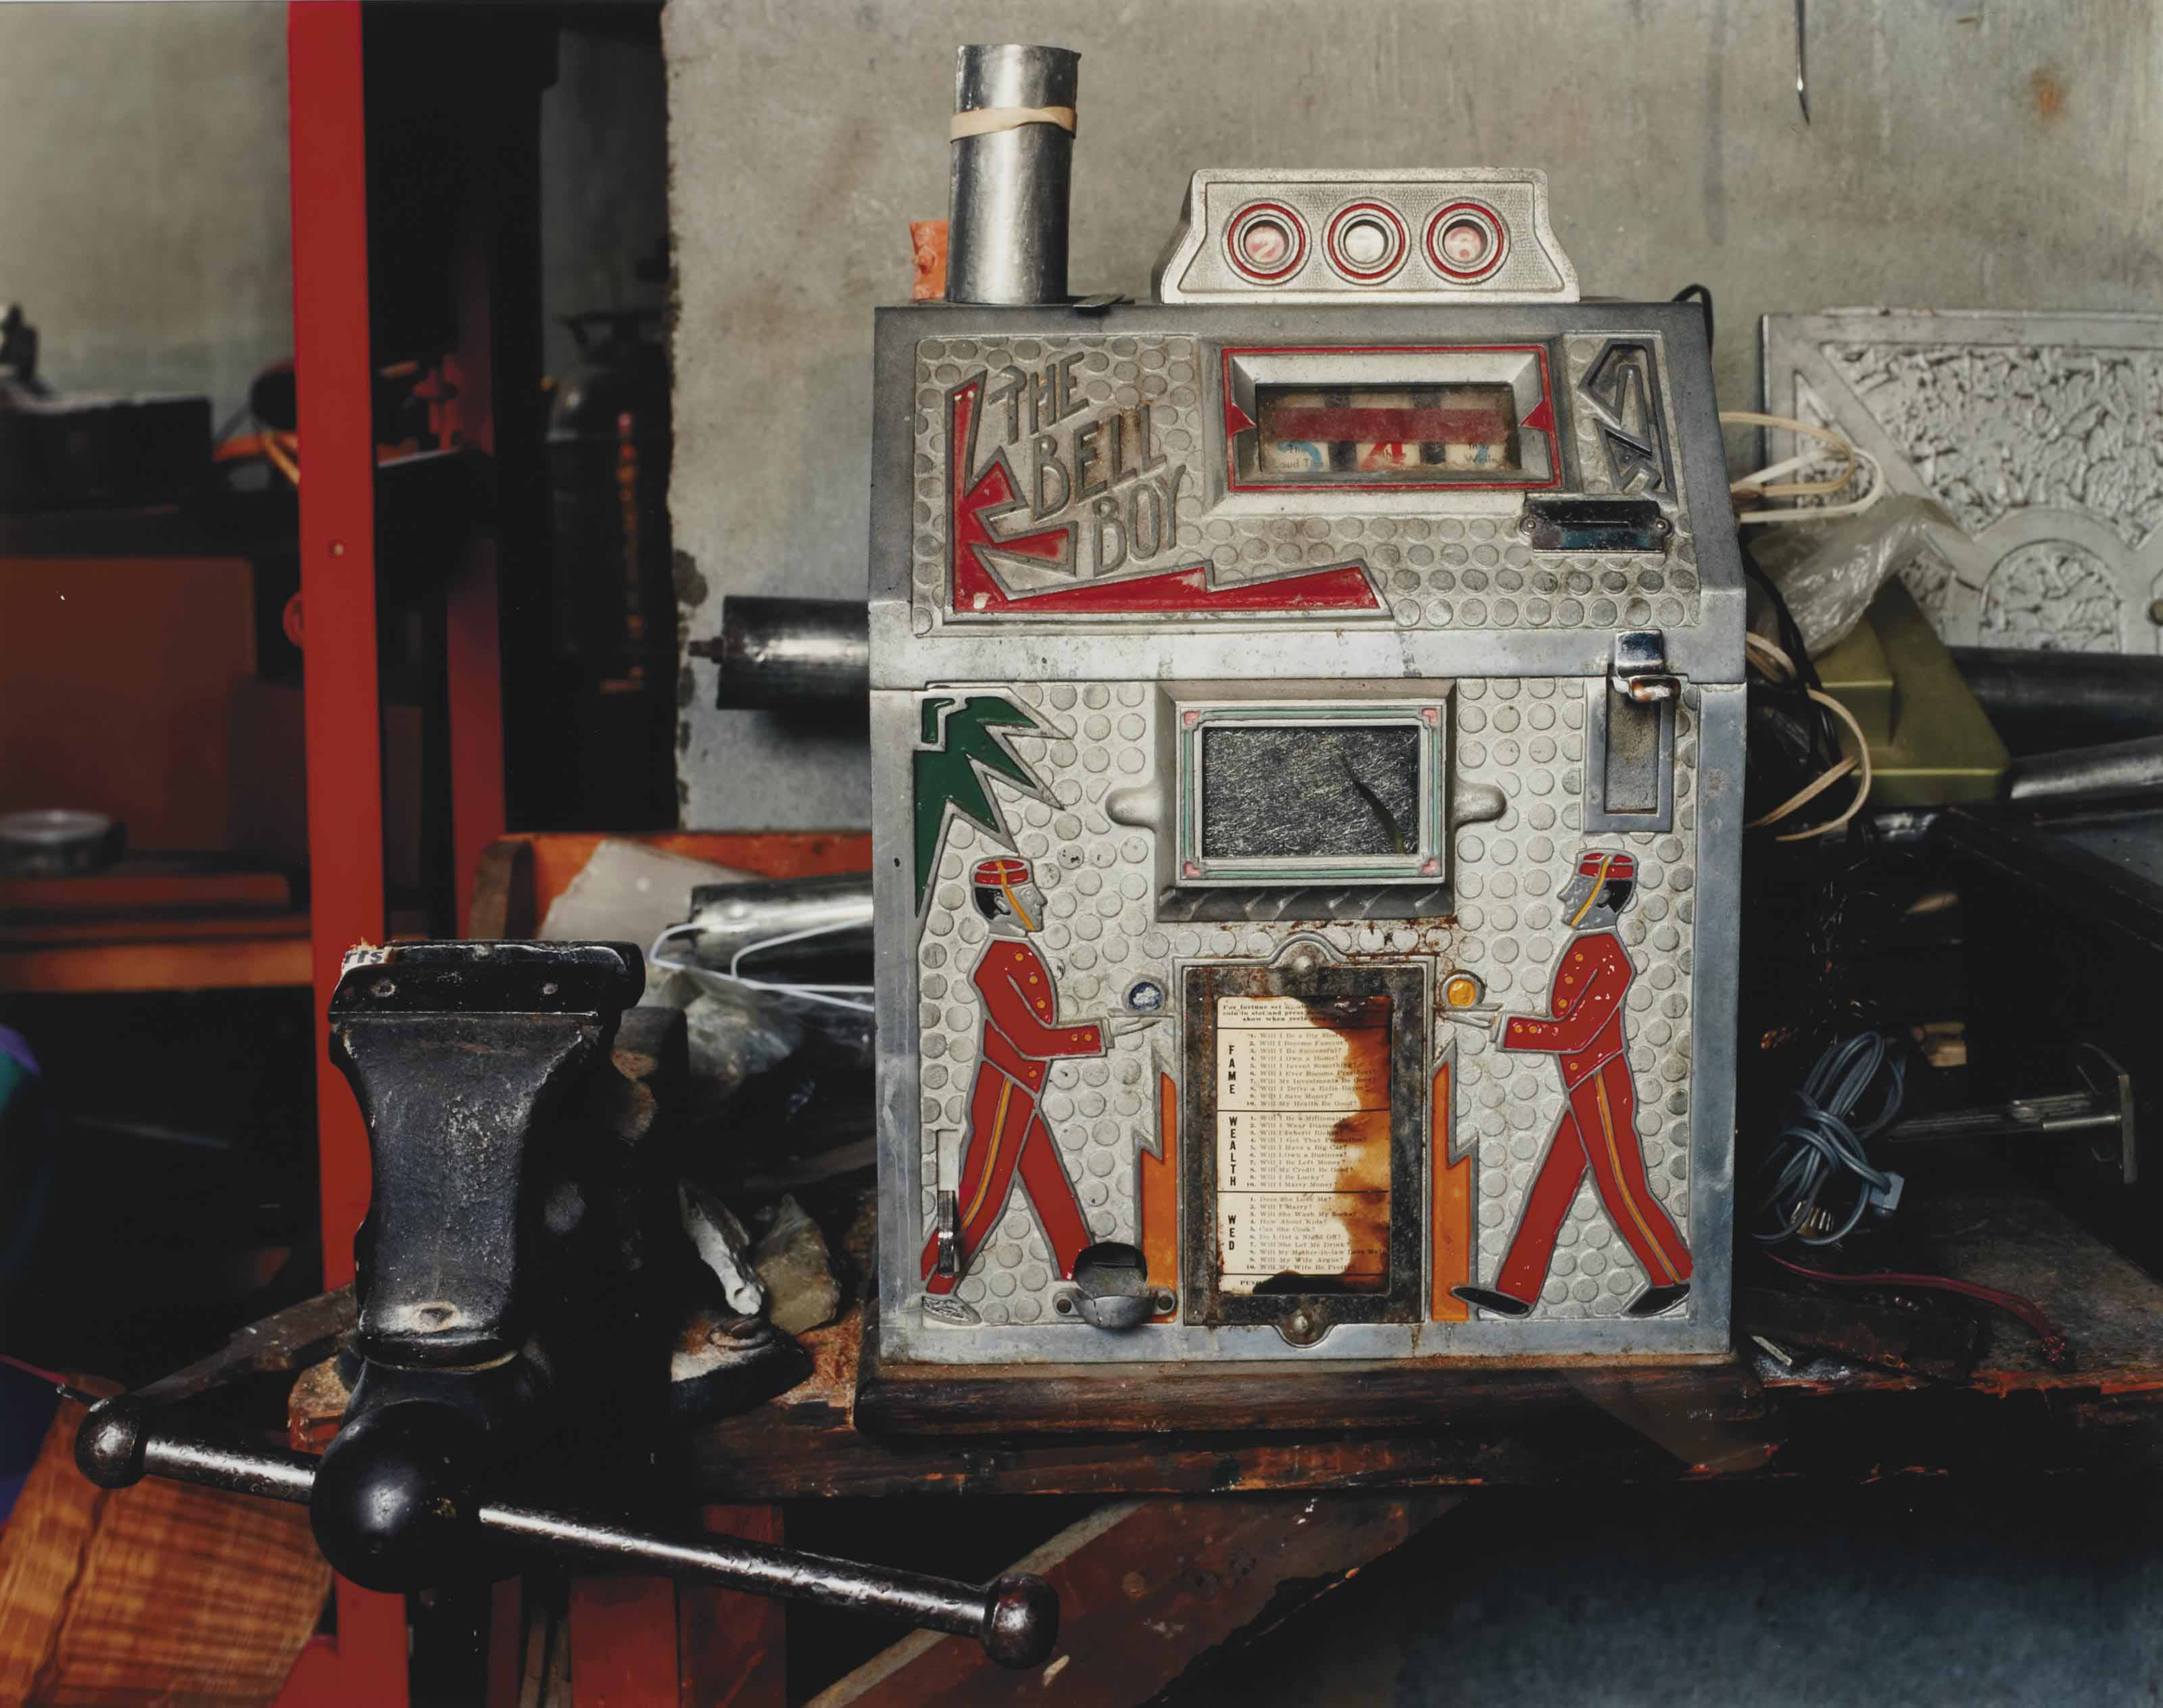 Dad's Basement Workshop, (bell boy game), Holyoke, MA, 2000